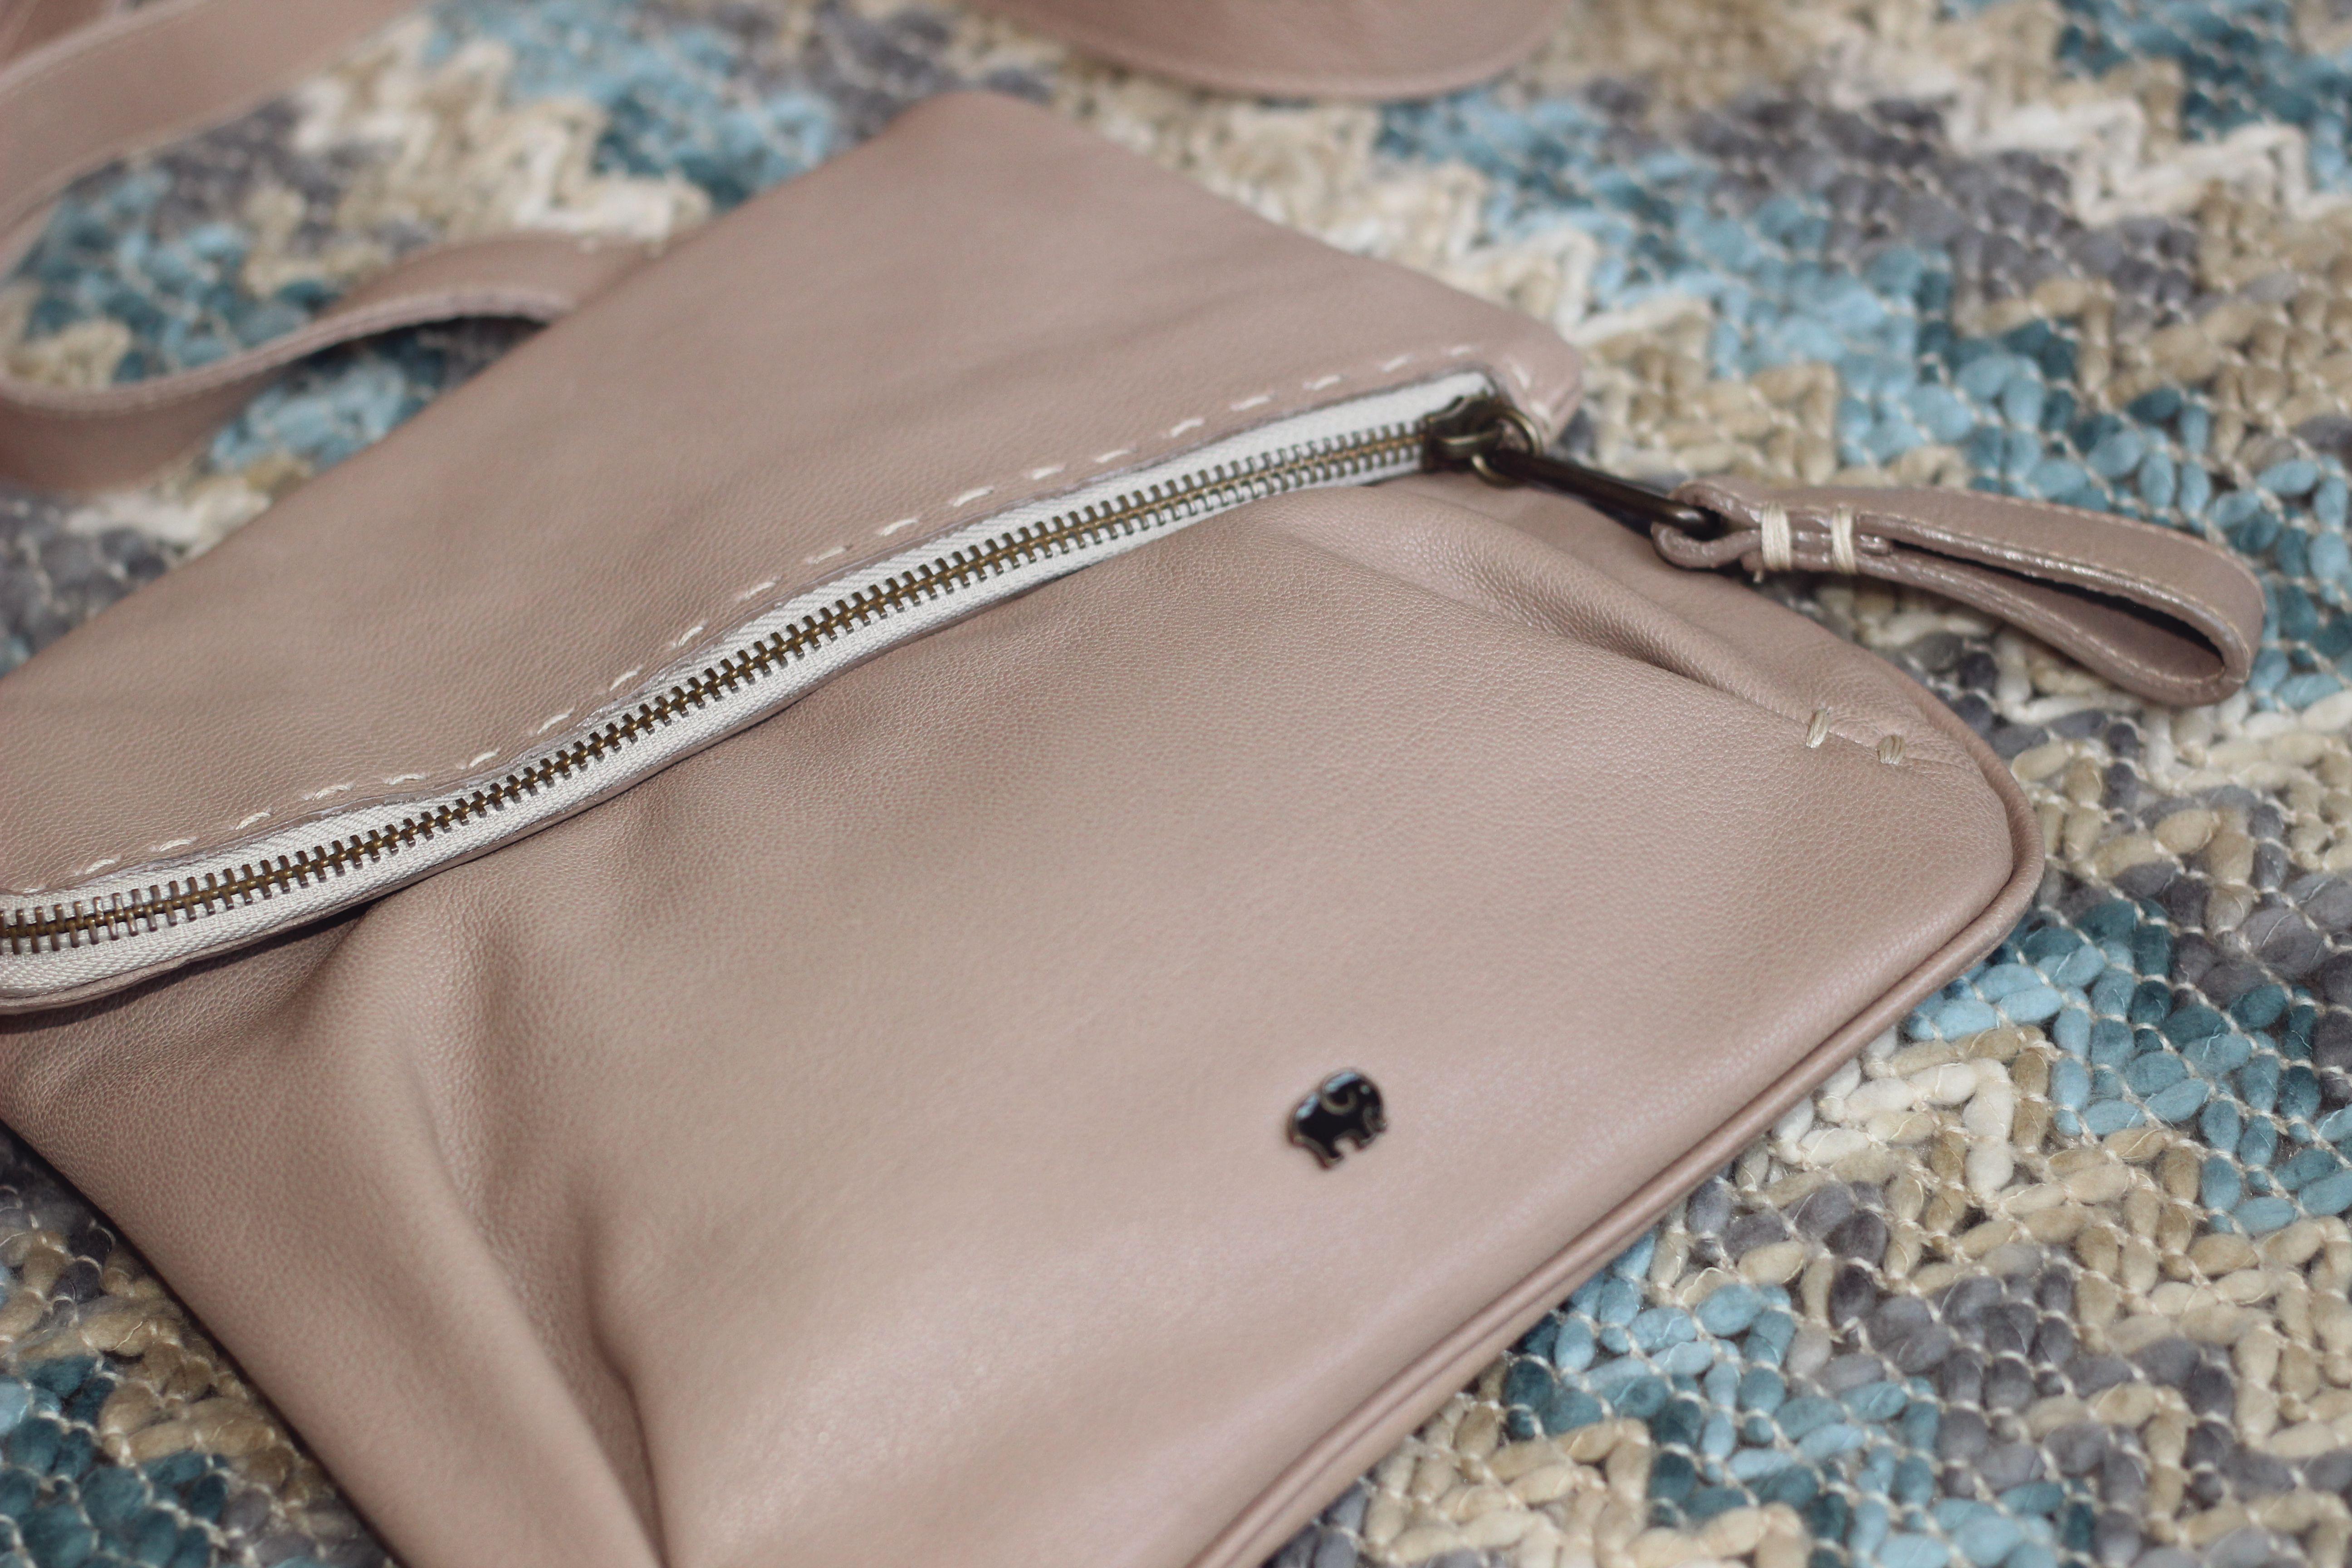 Nasiphi Cross Body Handbag In Canna Tsonga Handbags Handmade South Africa